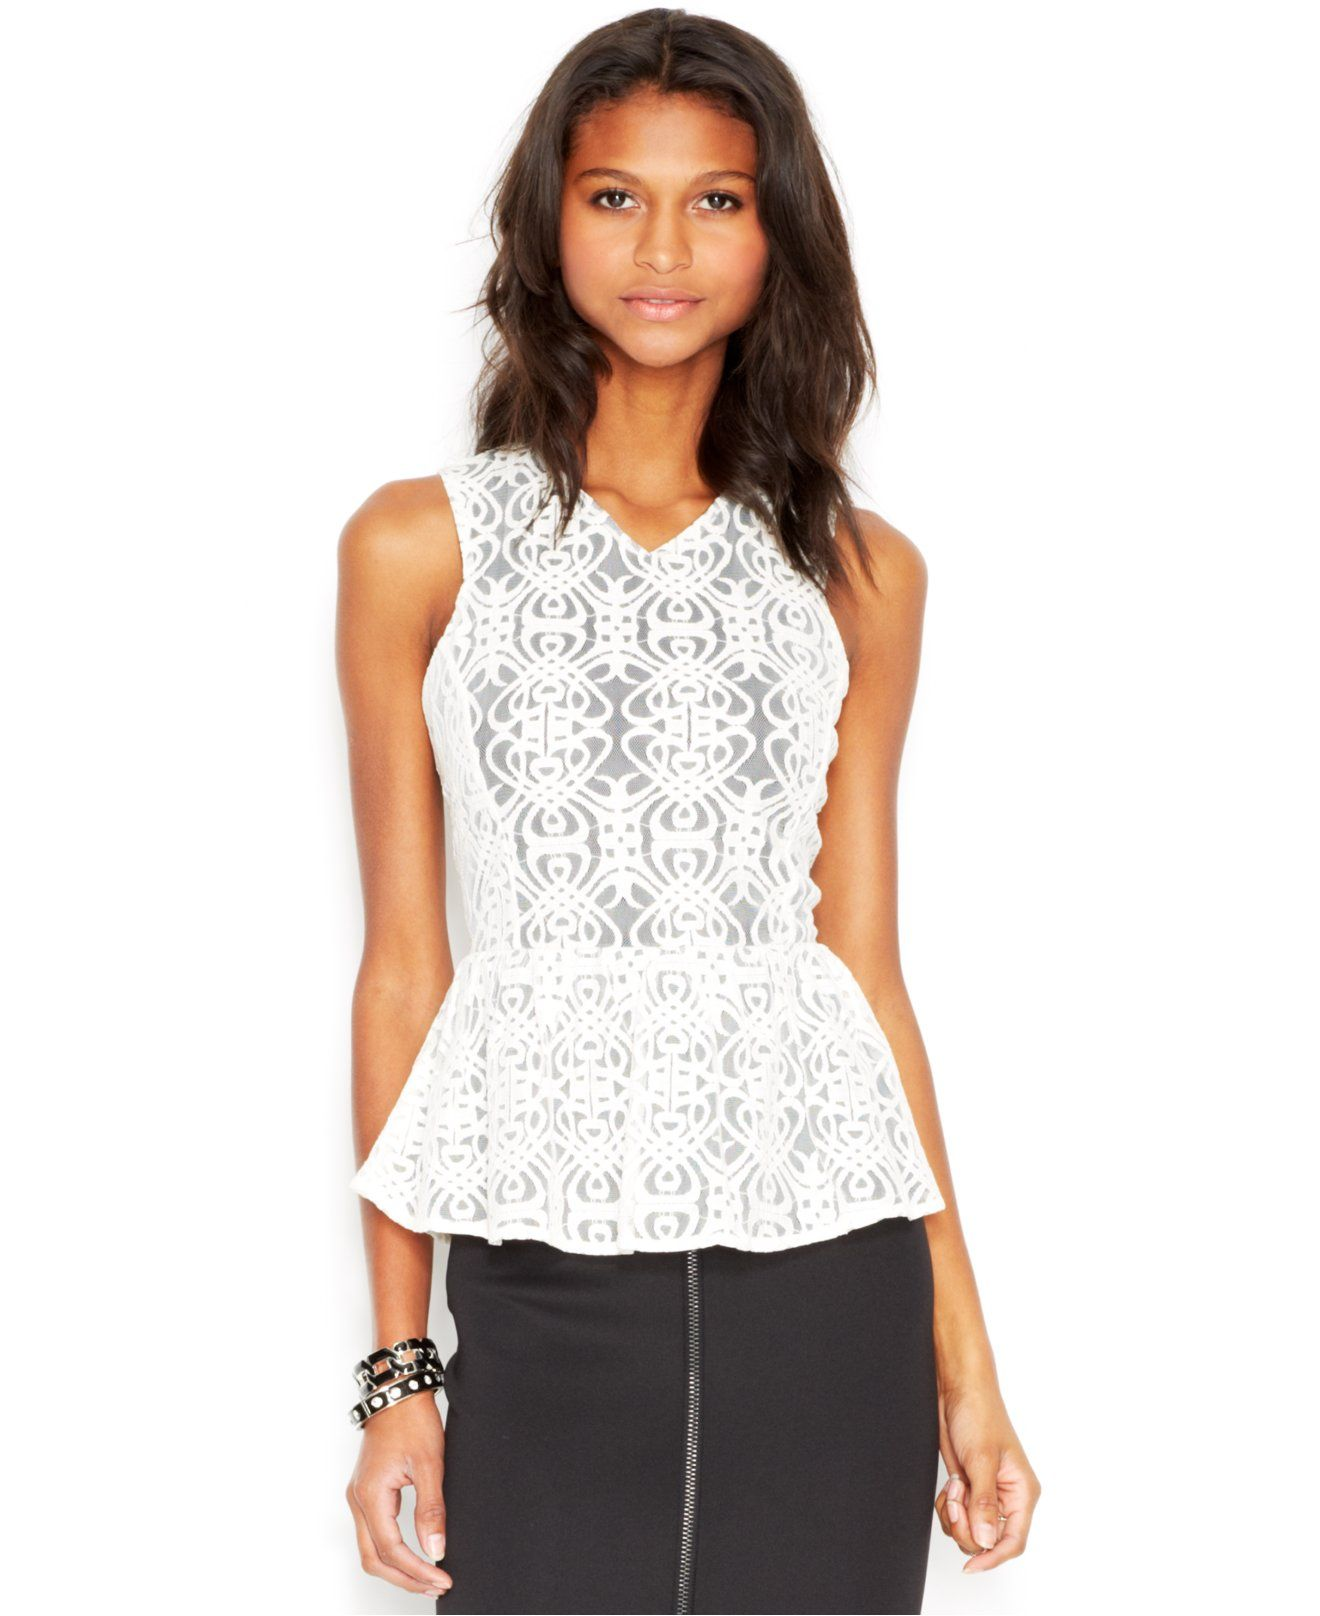 Lace dress macys  Bar III Sleeveless Lace Peplum Top  Tops  Women  Macyus  Clothes